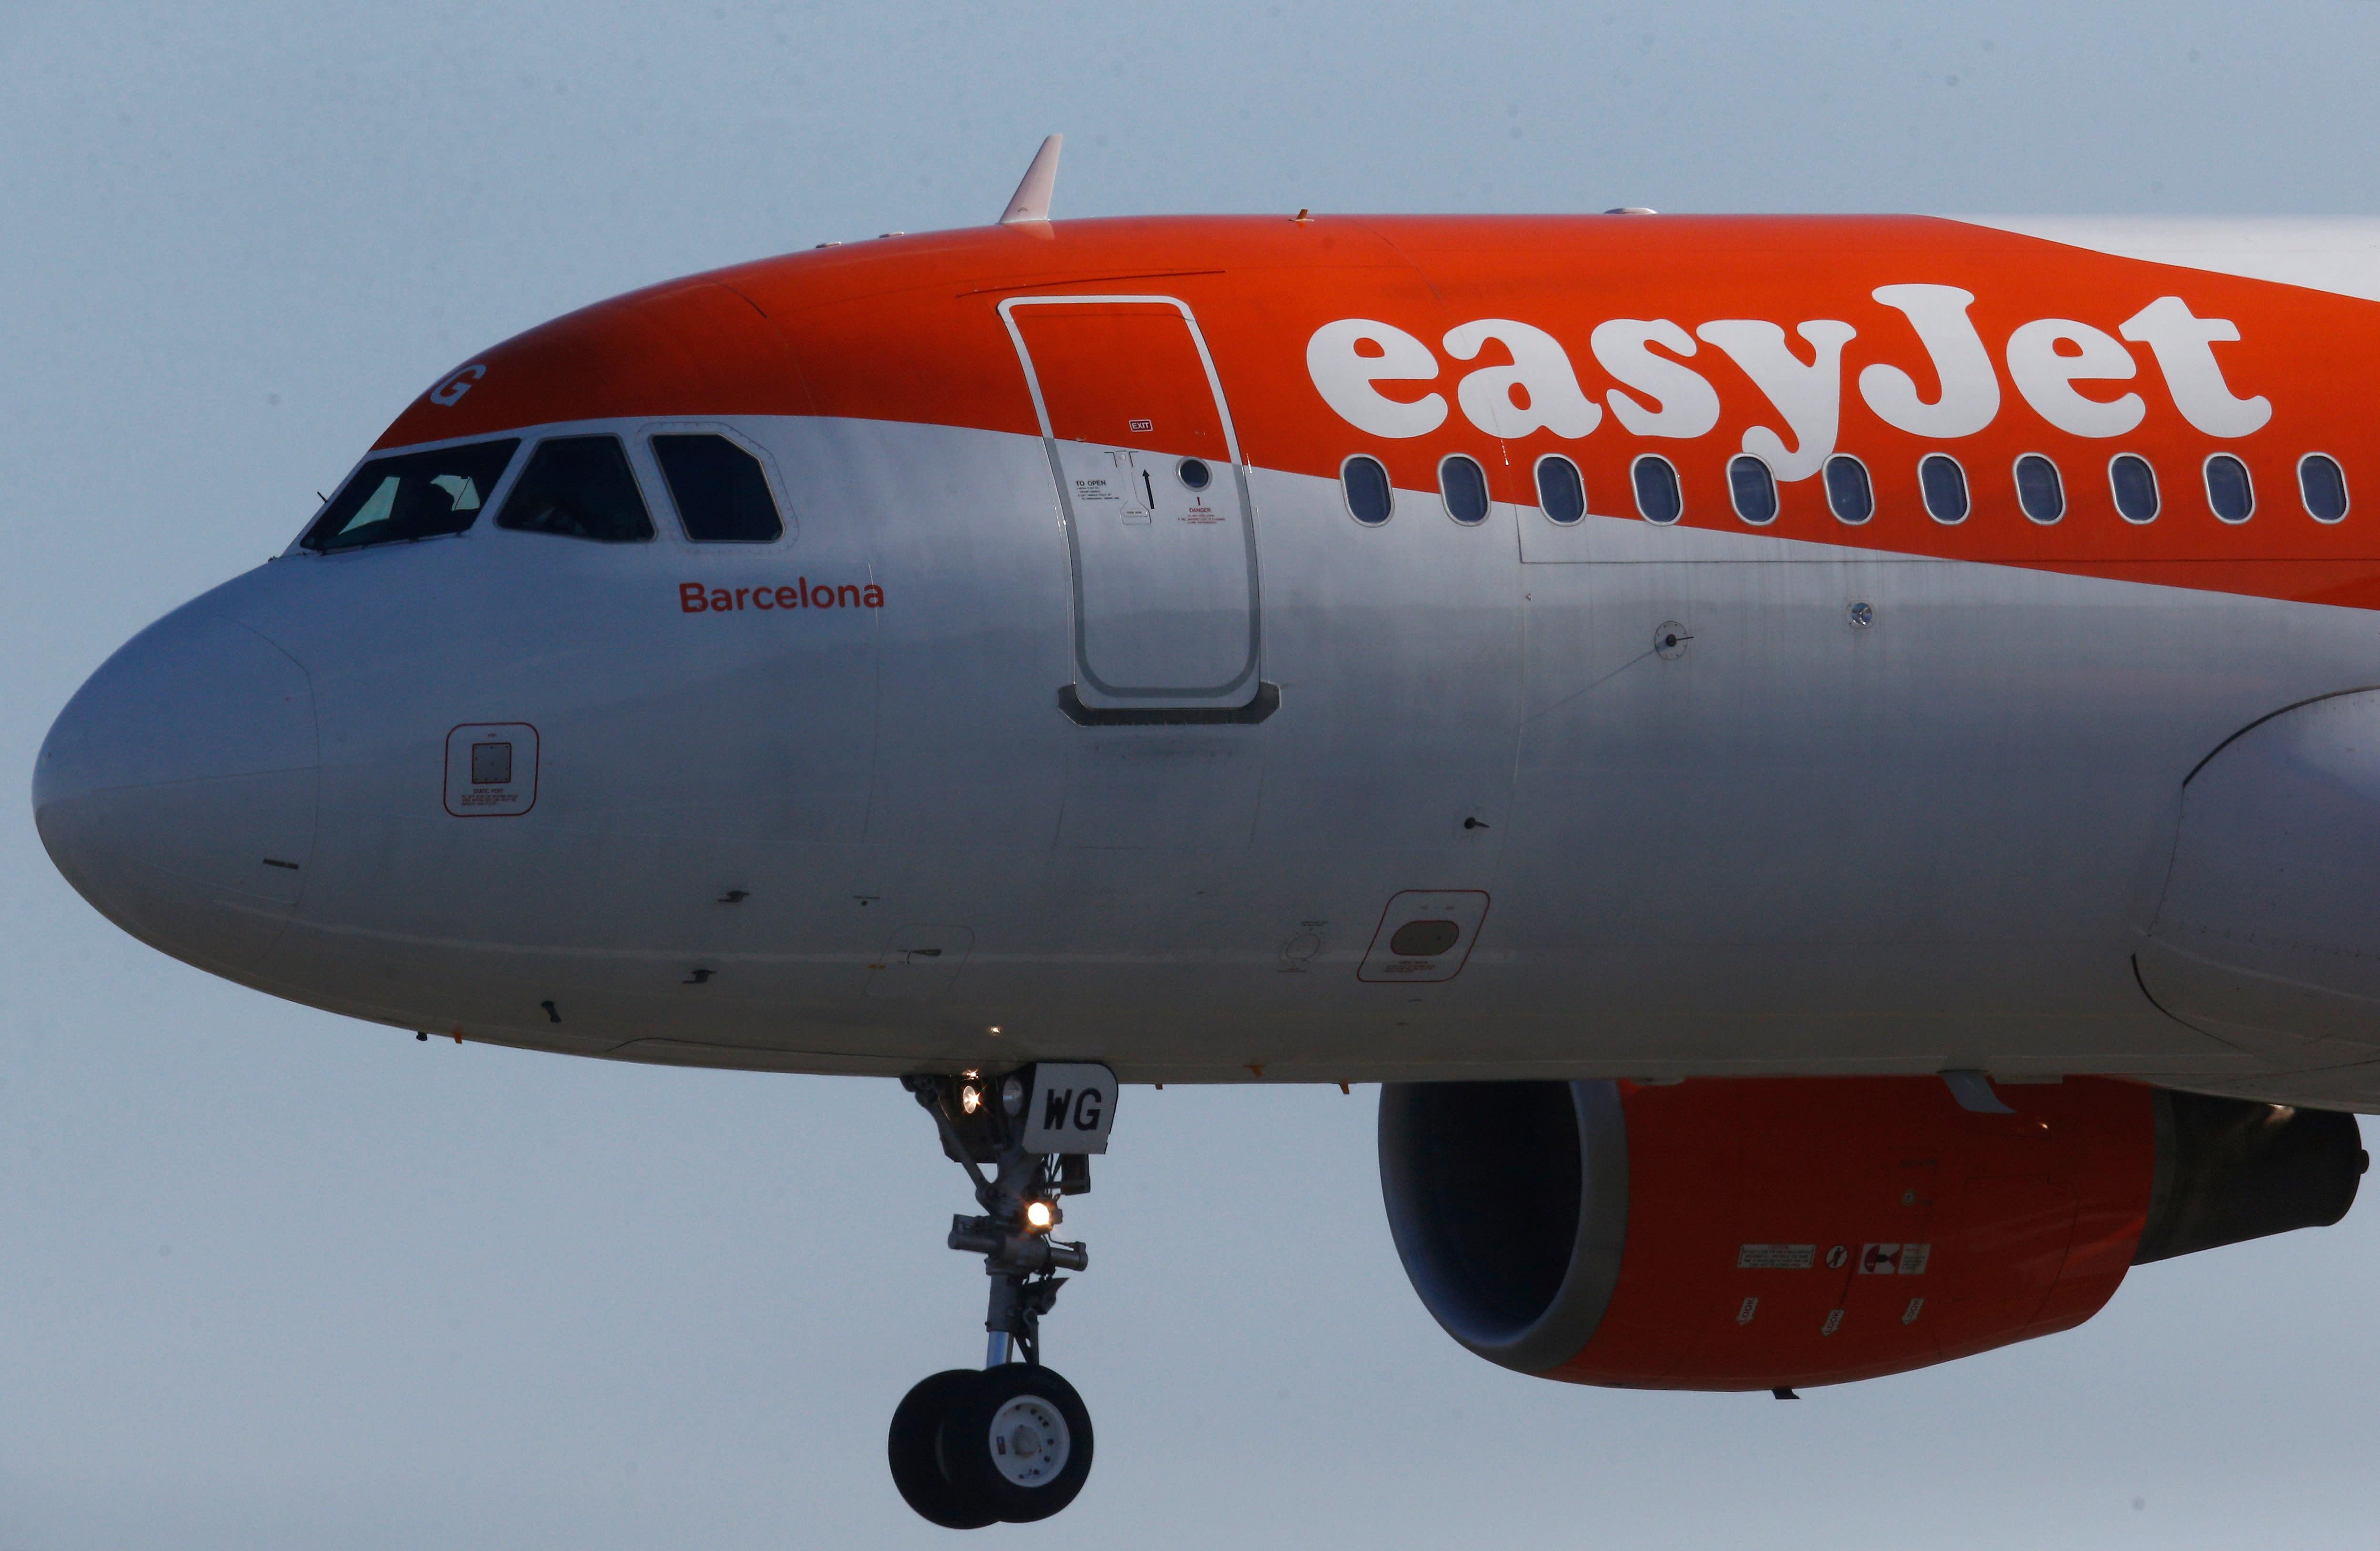 Plane strikes at rivals boost demand at Easyjet